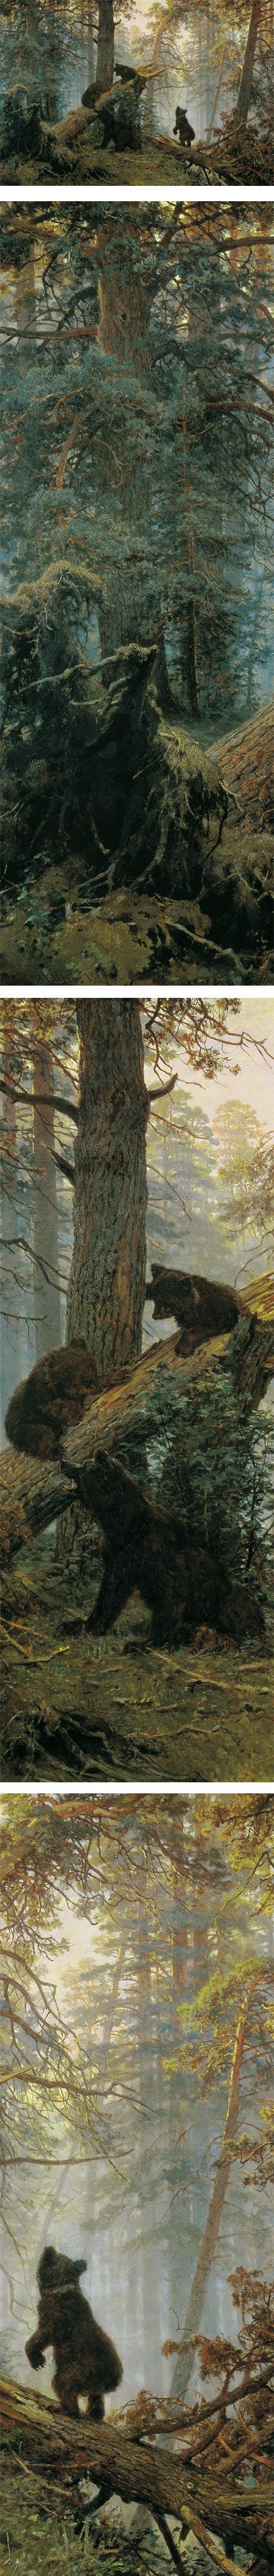 Morning in a Pine Forest, Ivan Shishkin and Konstantin Savitsky